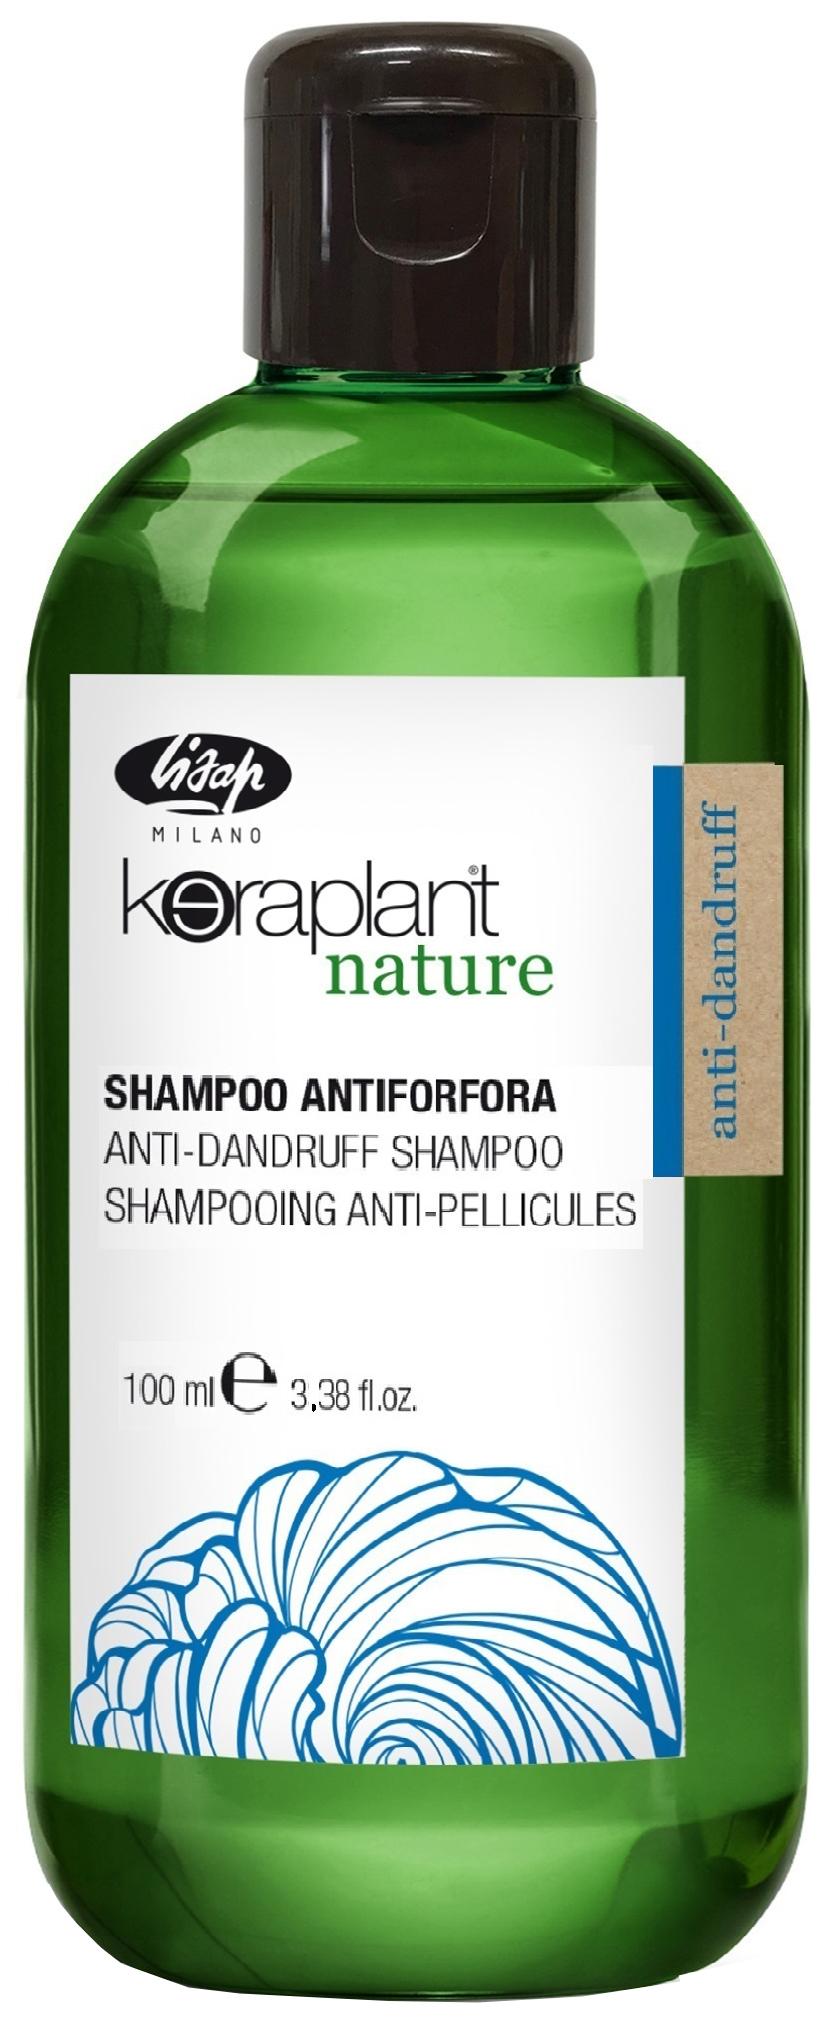 Шампунь Lisap Milano Keraplant Nature Anti-Dandruff Shampoo 100 мл